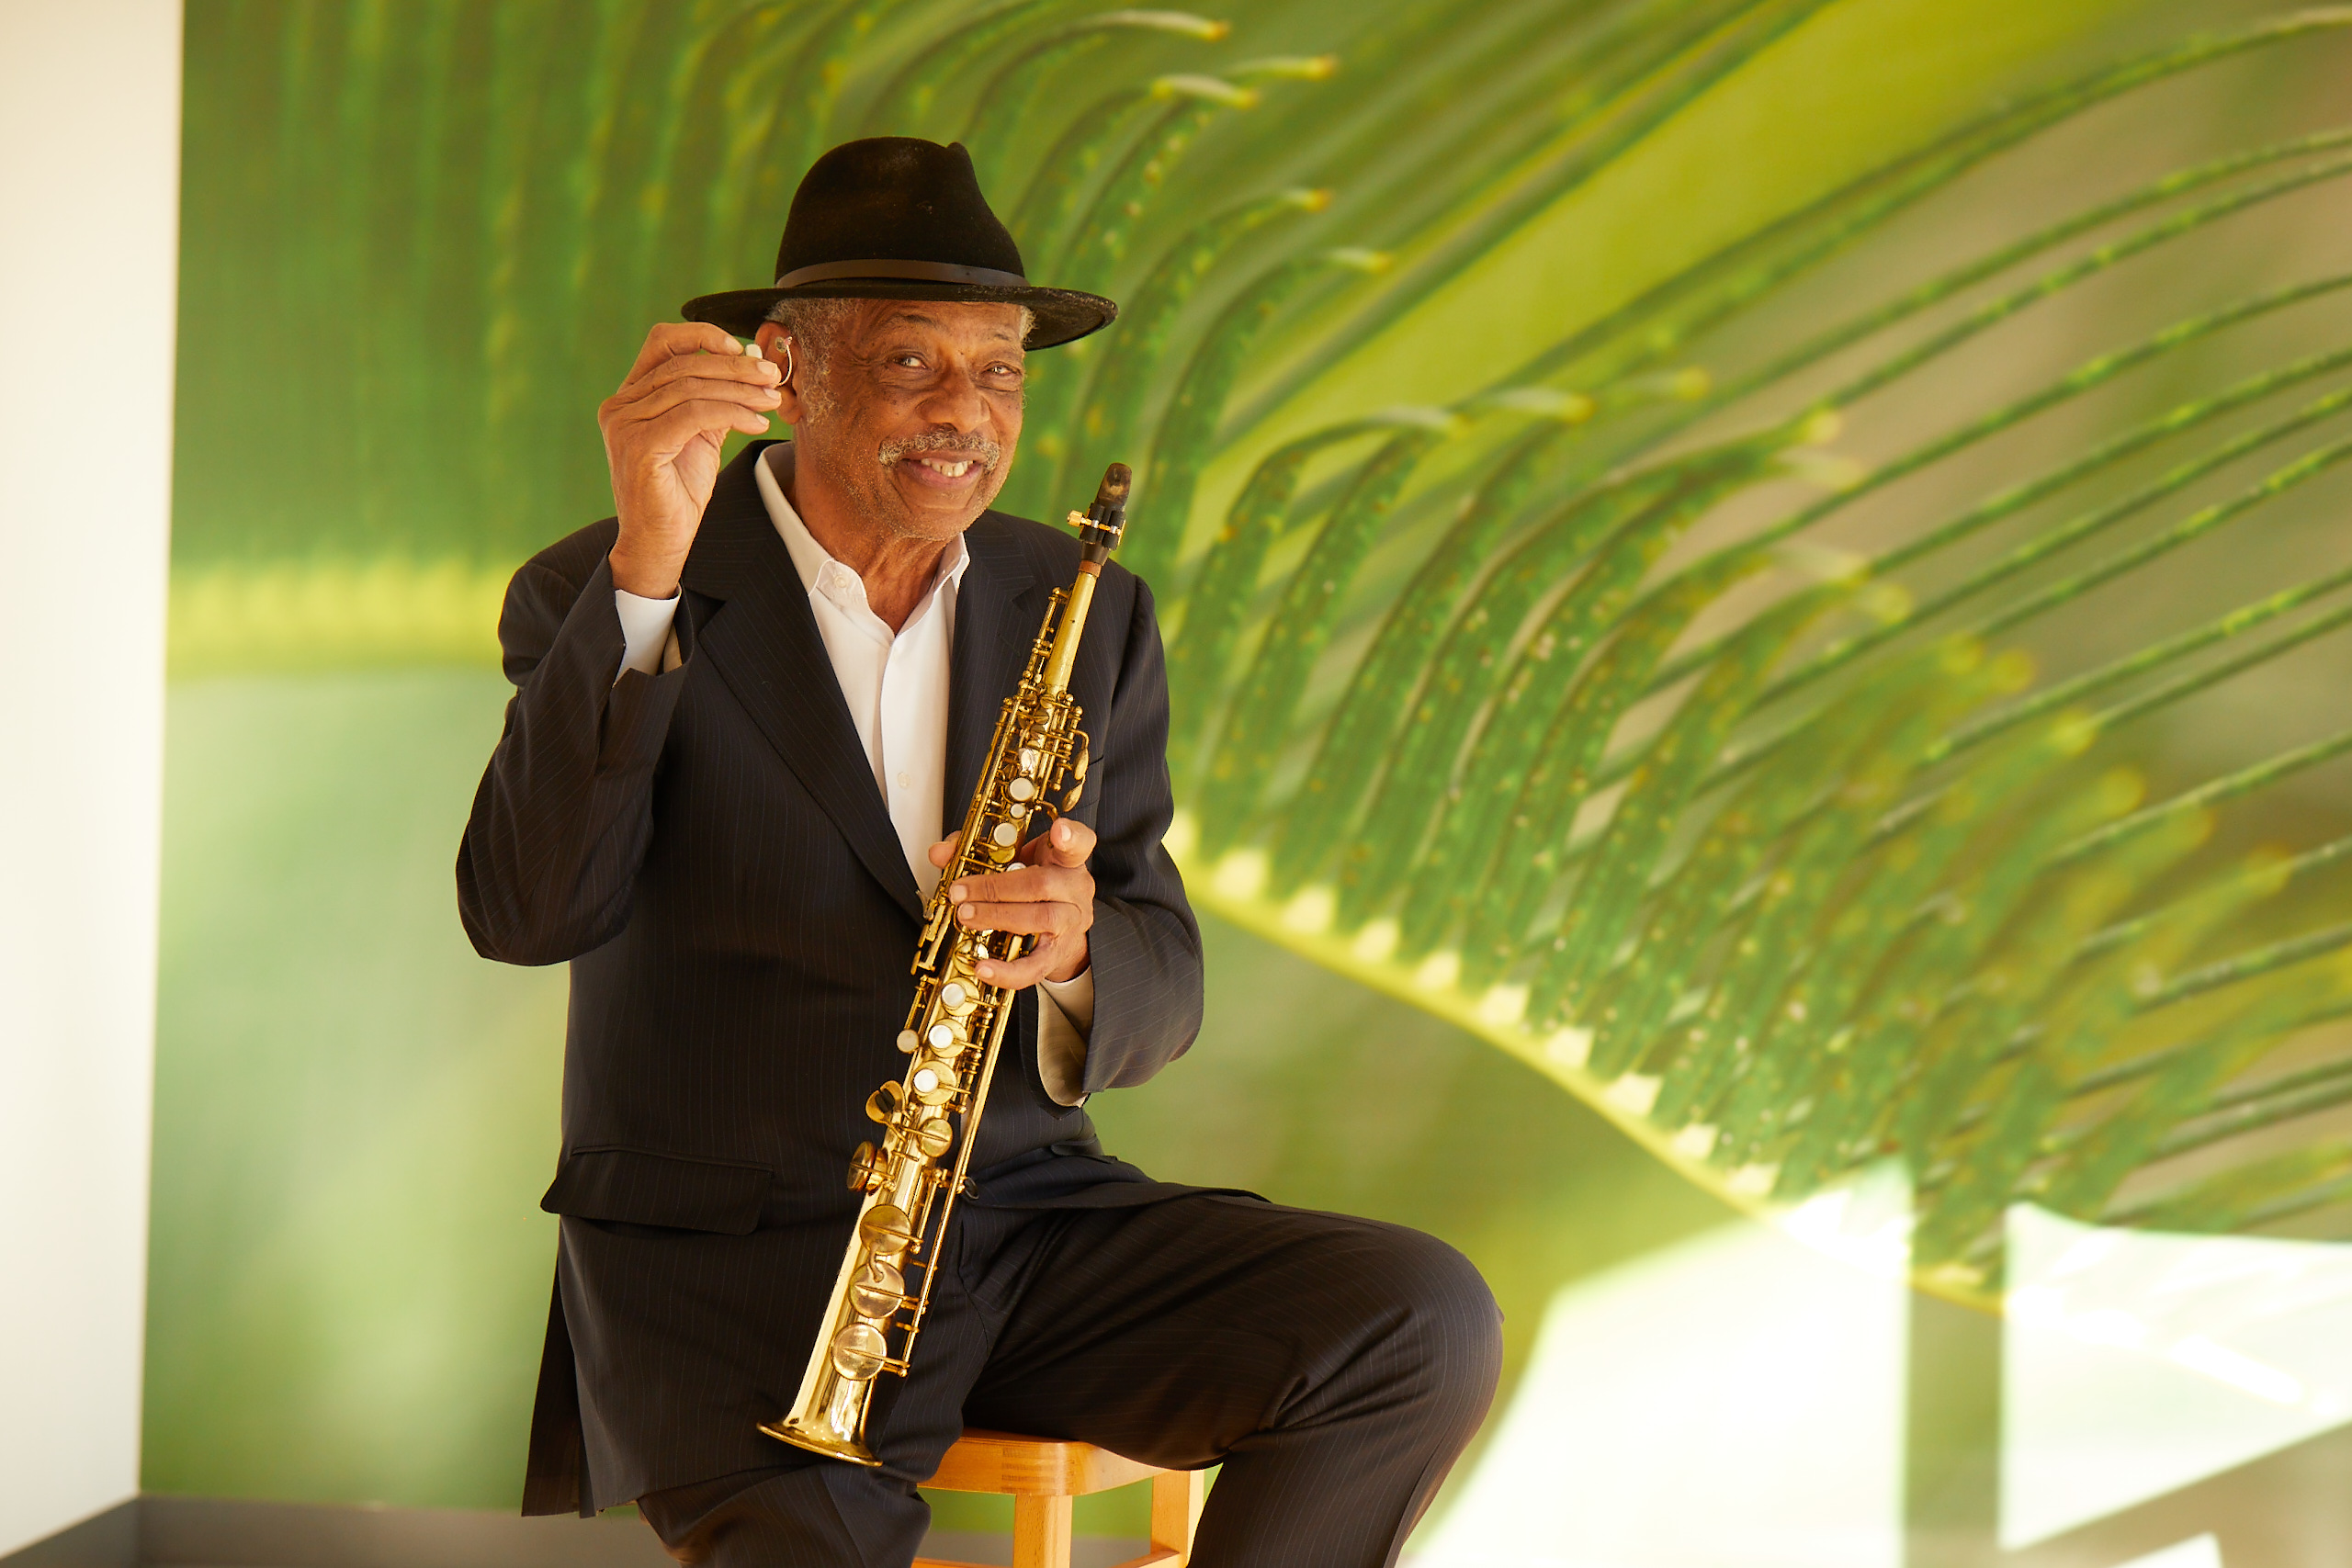 New hearing aids for jazz legend Charles Owens | Sonova International